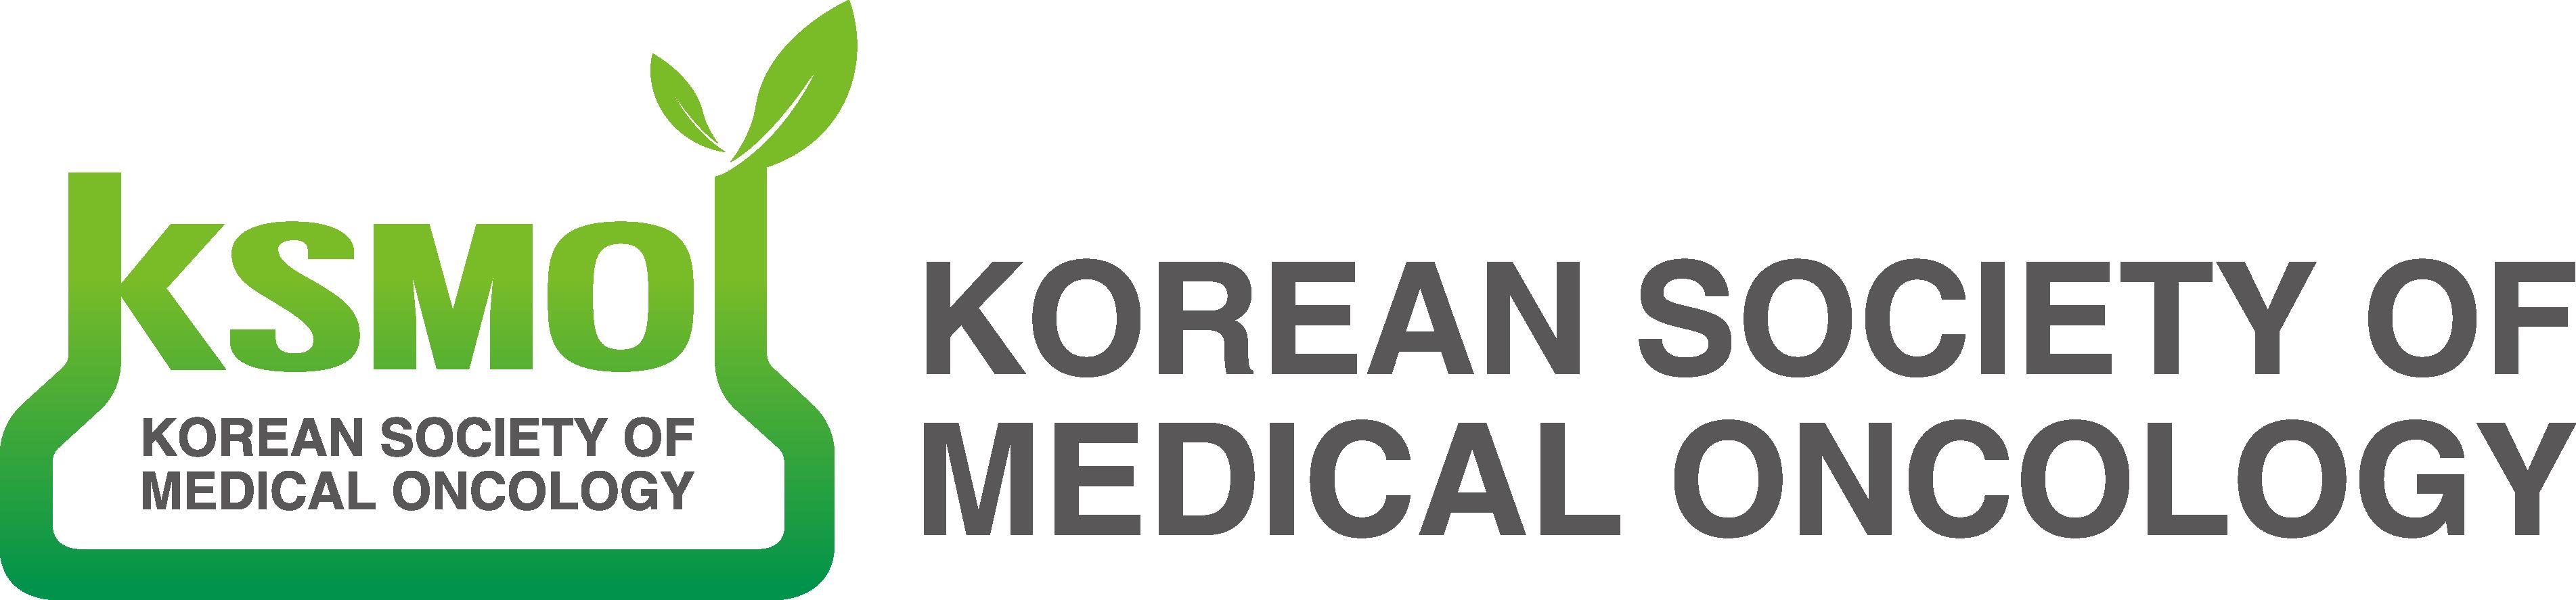 Korean Society of Medical Oncology Logo